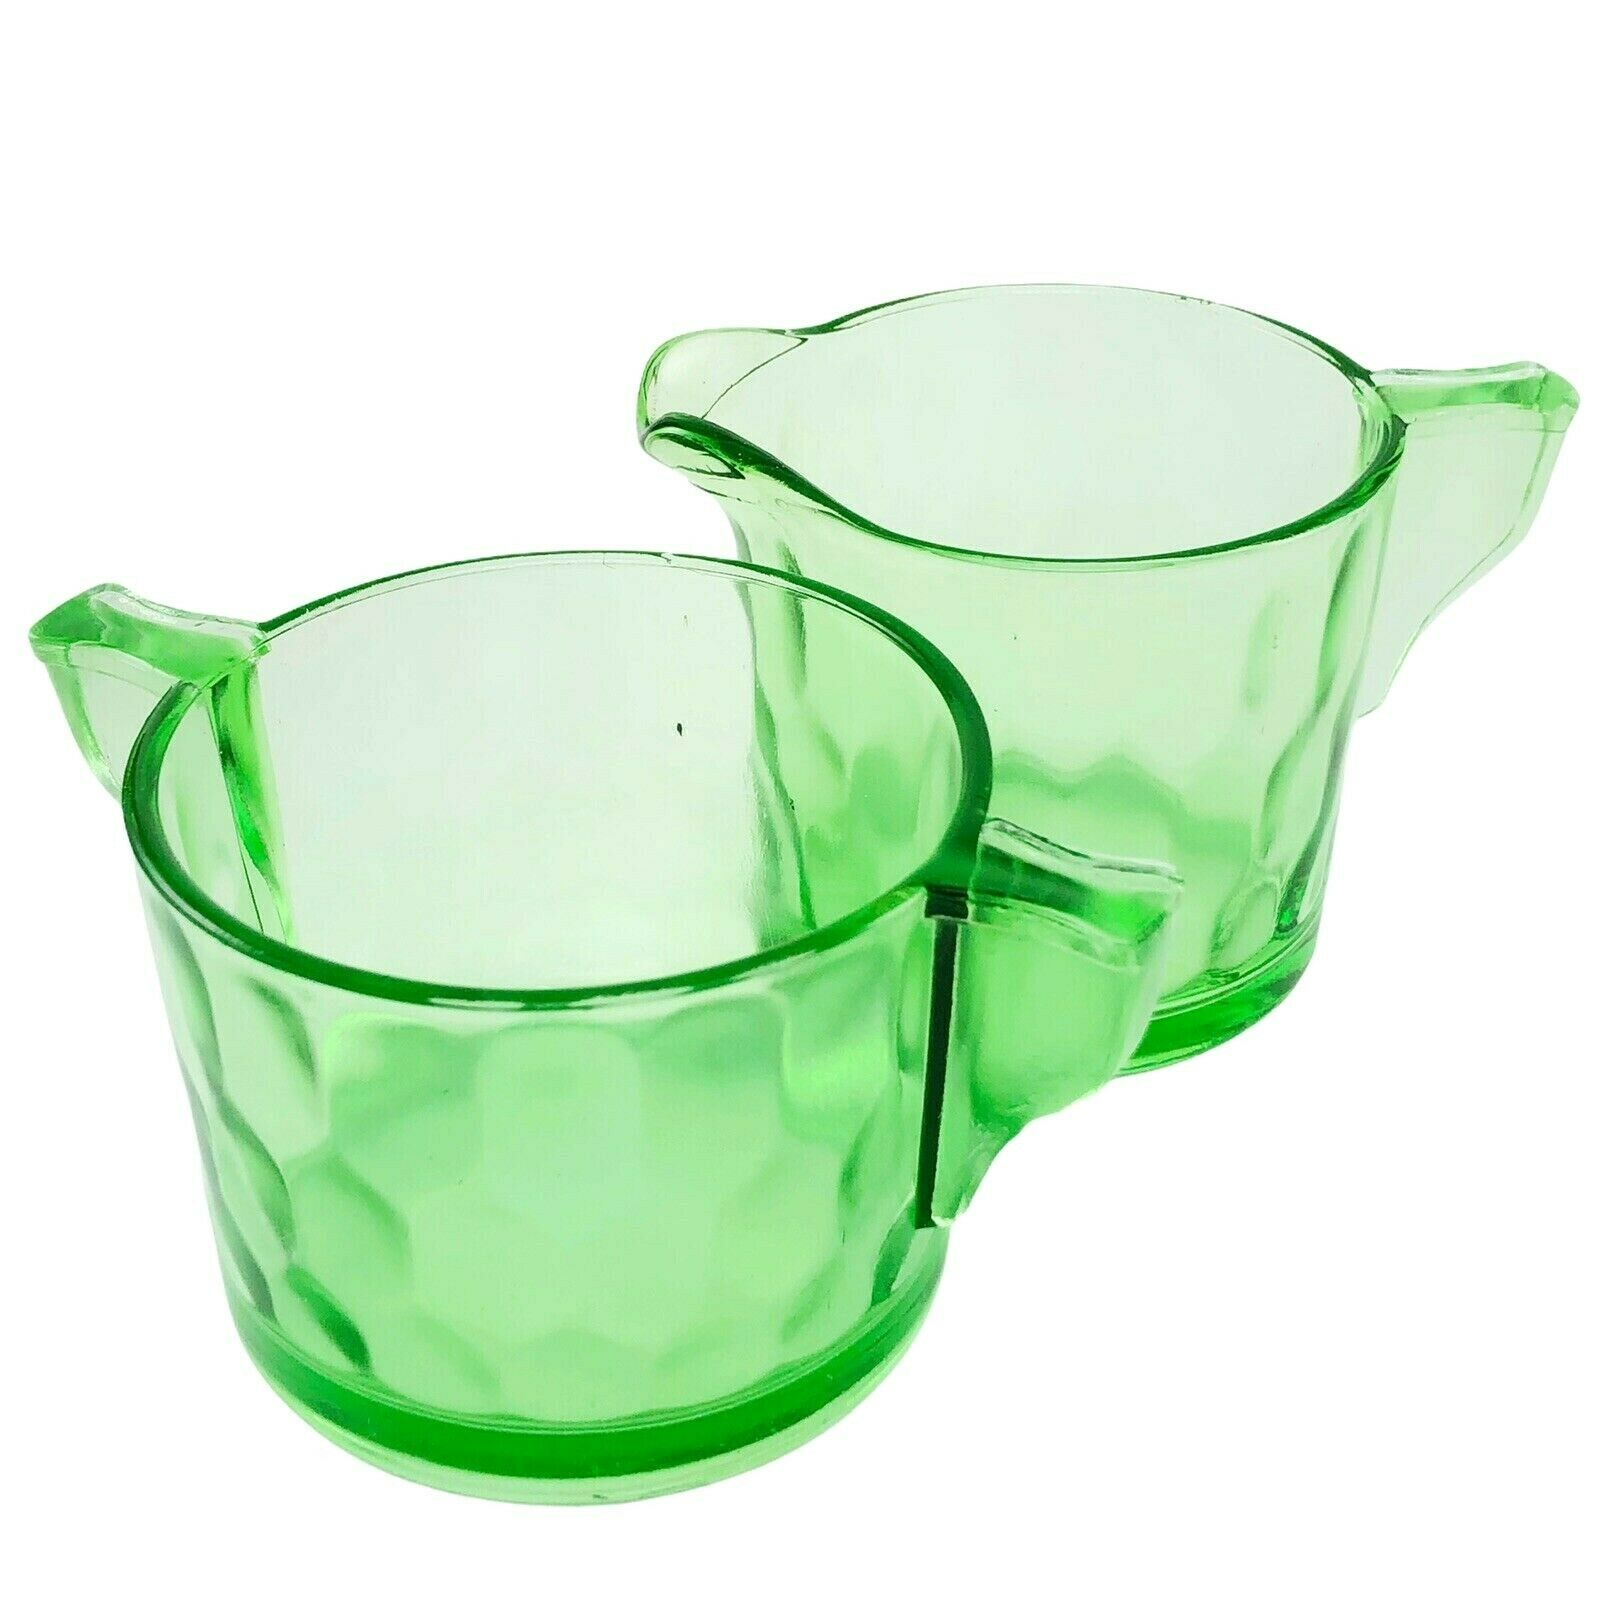 Jeannette Depression Glass Creamer Sugar Hex Optic Honeycomb Green Vaseline Vtg - $18.95